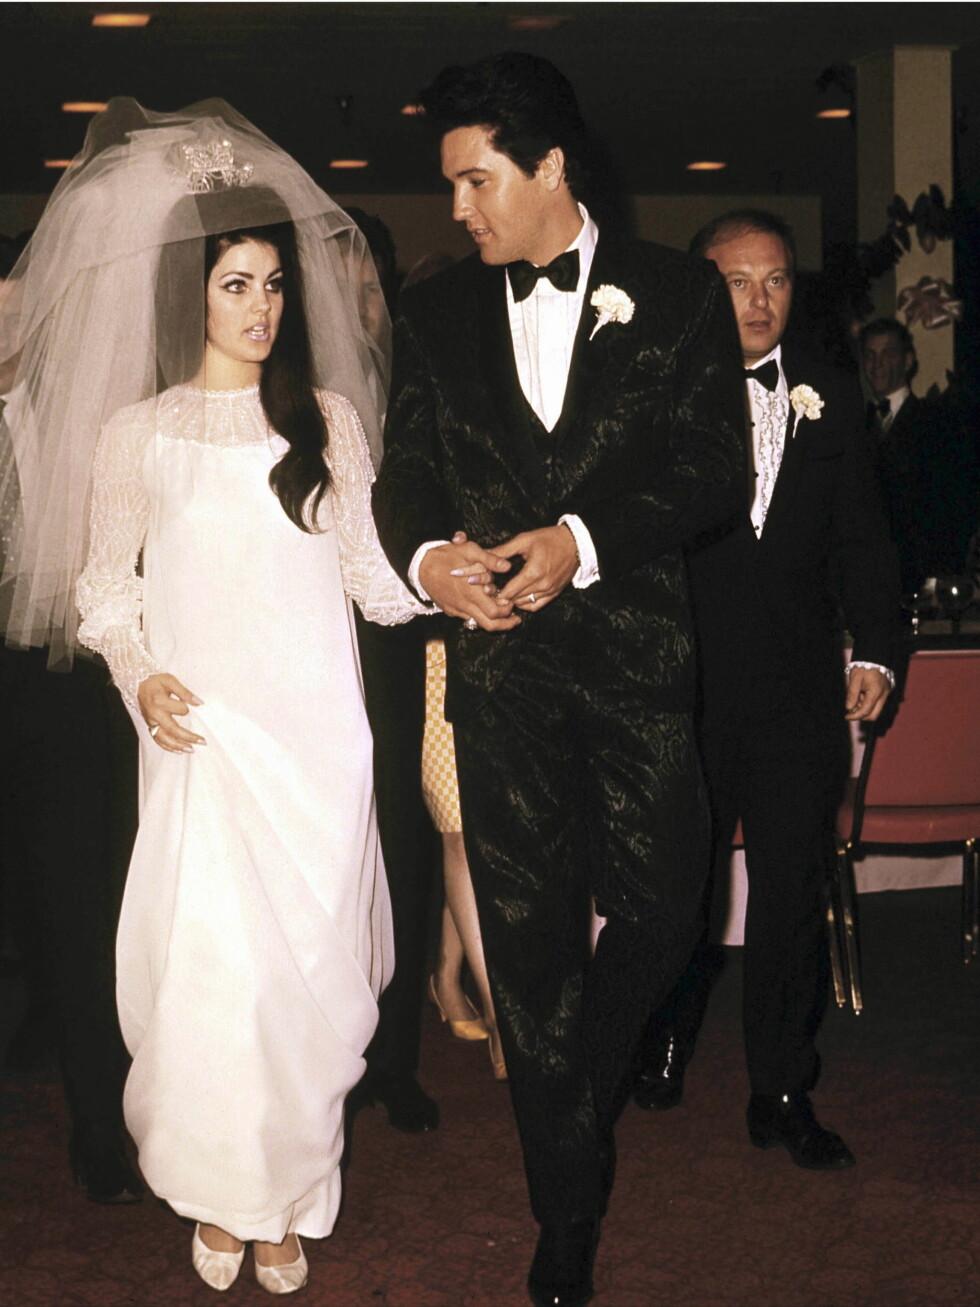 Elvis møtte sin utkårede, Priscilla Beaulieu, i Tyskland da hun bare var 14 år, og altfor ung til å gifte seg. Han ventet på henne, og i 1967 sto bryllupet. Foto: All Over Press